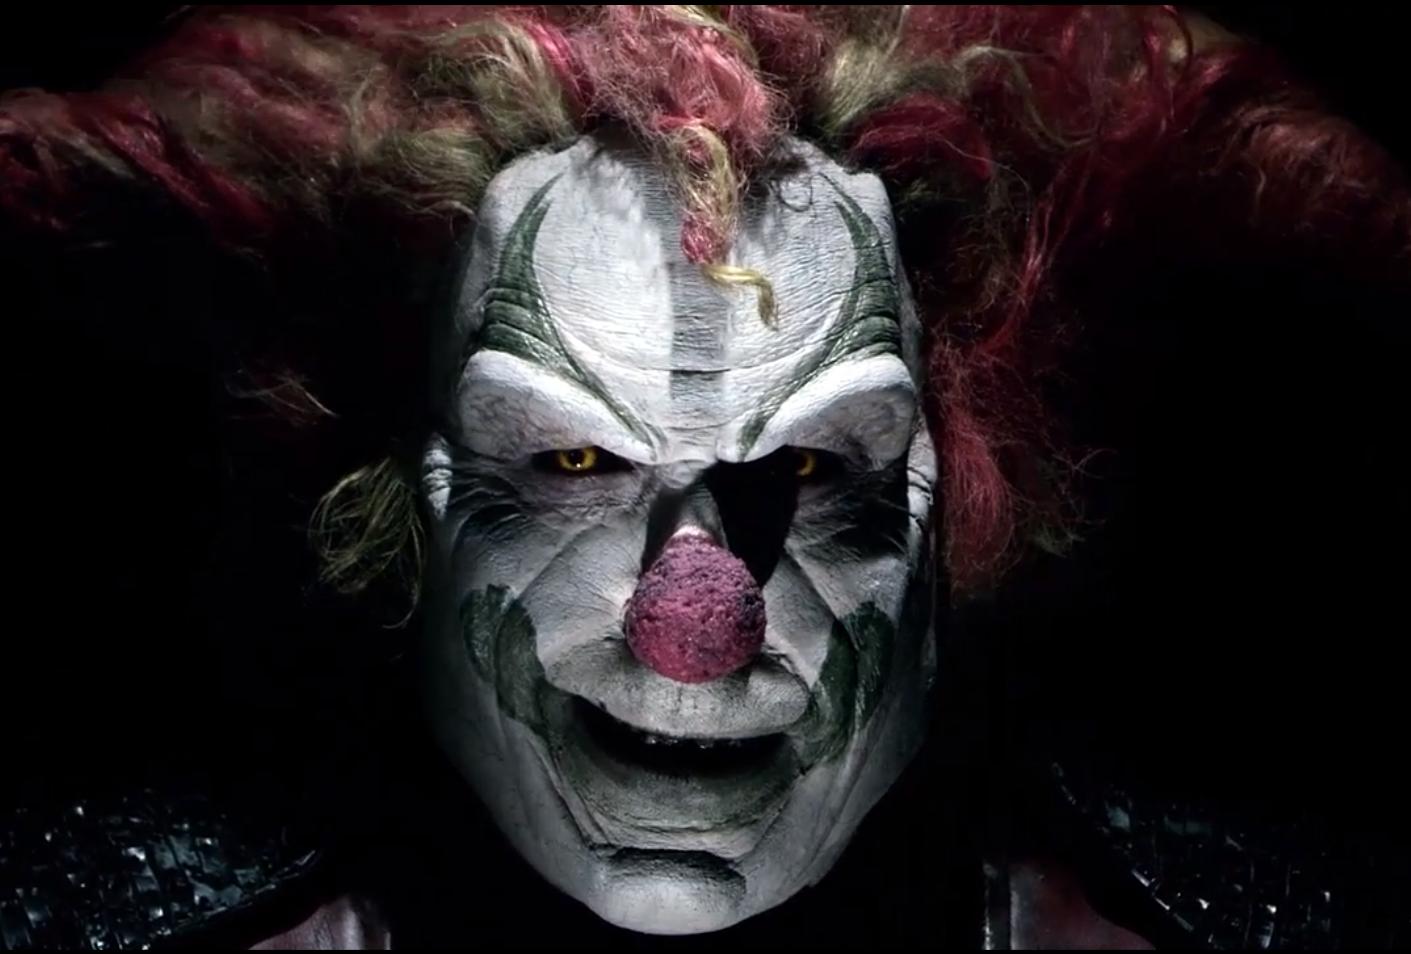 Insidious 2 Demon At The End NewsPlusNotes: Hallowe...